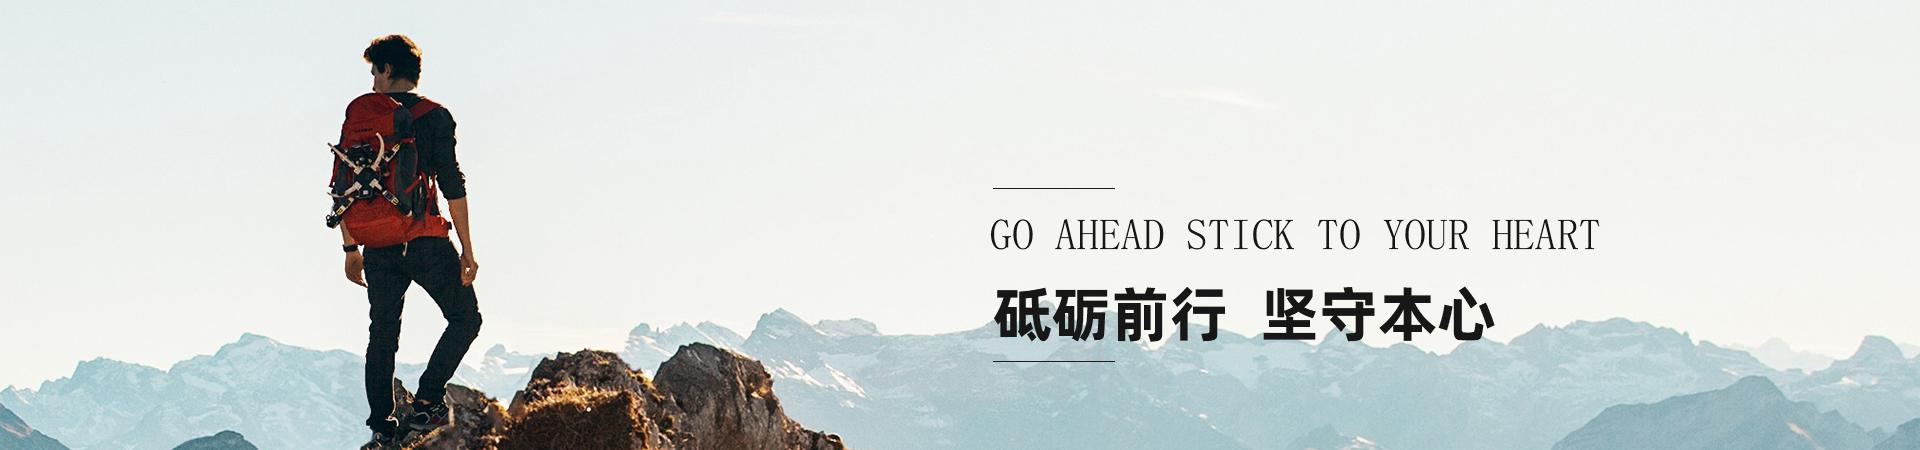 http://www.yuhuabaowen.com/data/upload/201911/20191107153242_173.jpg